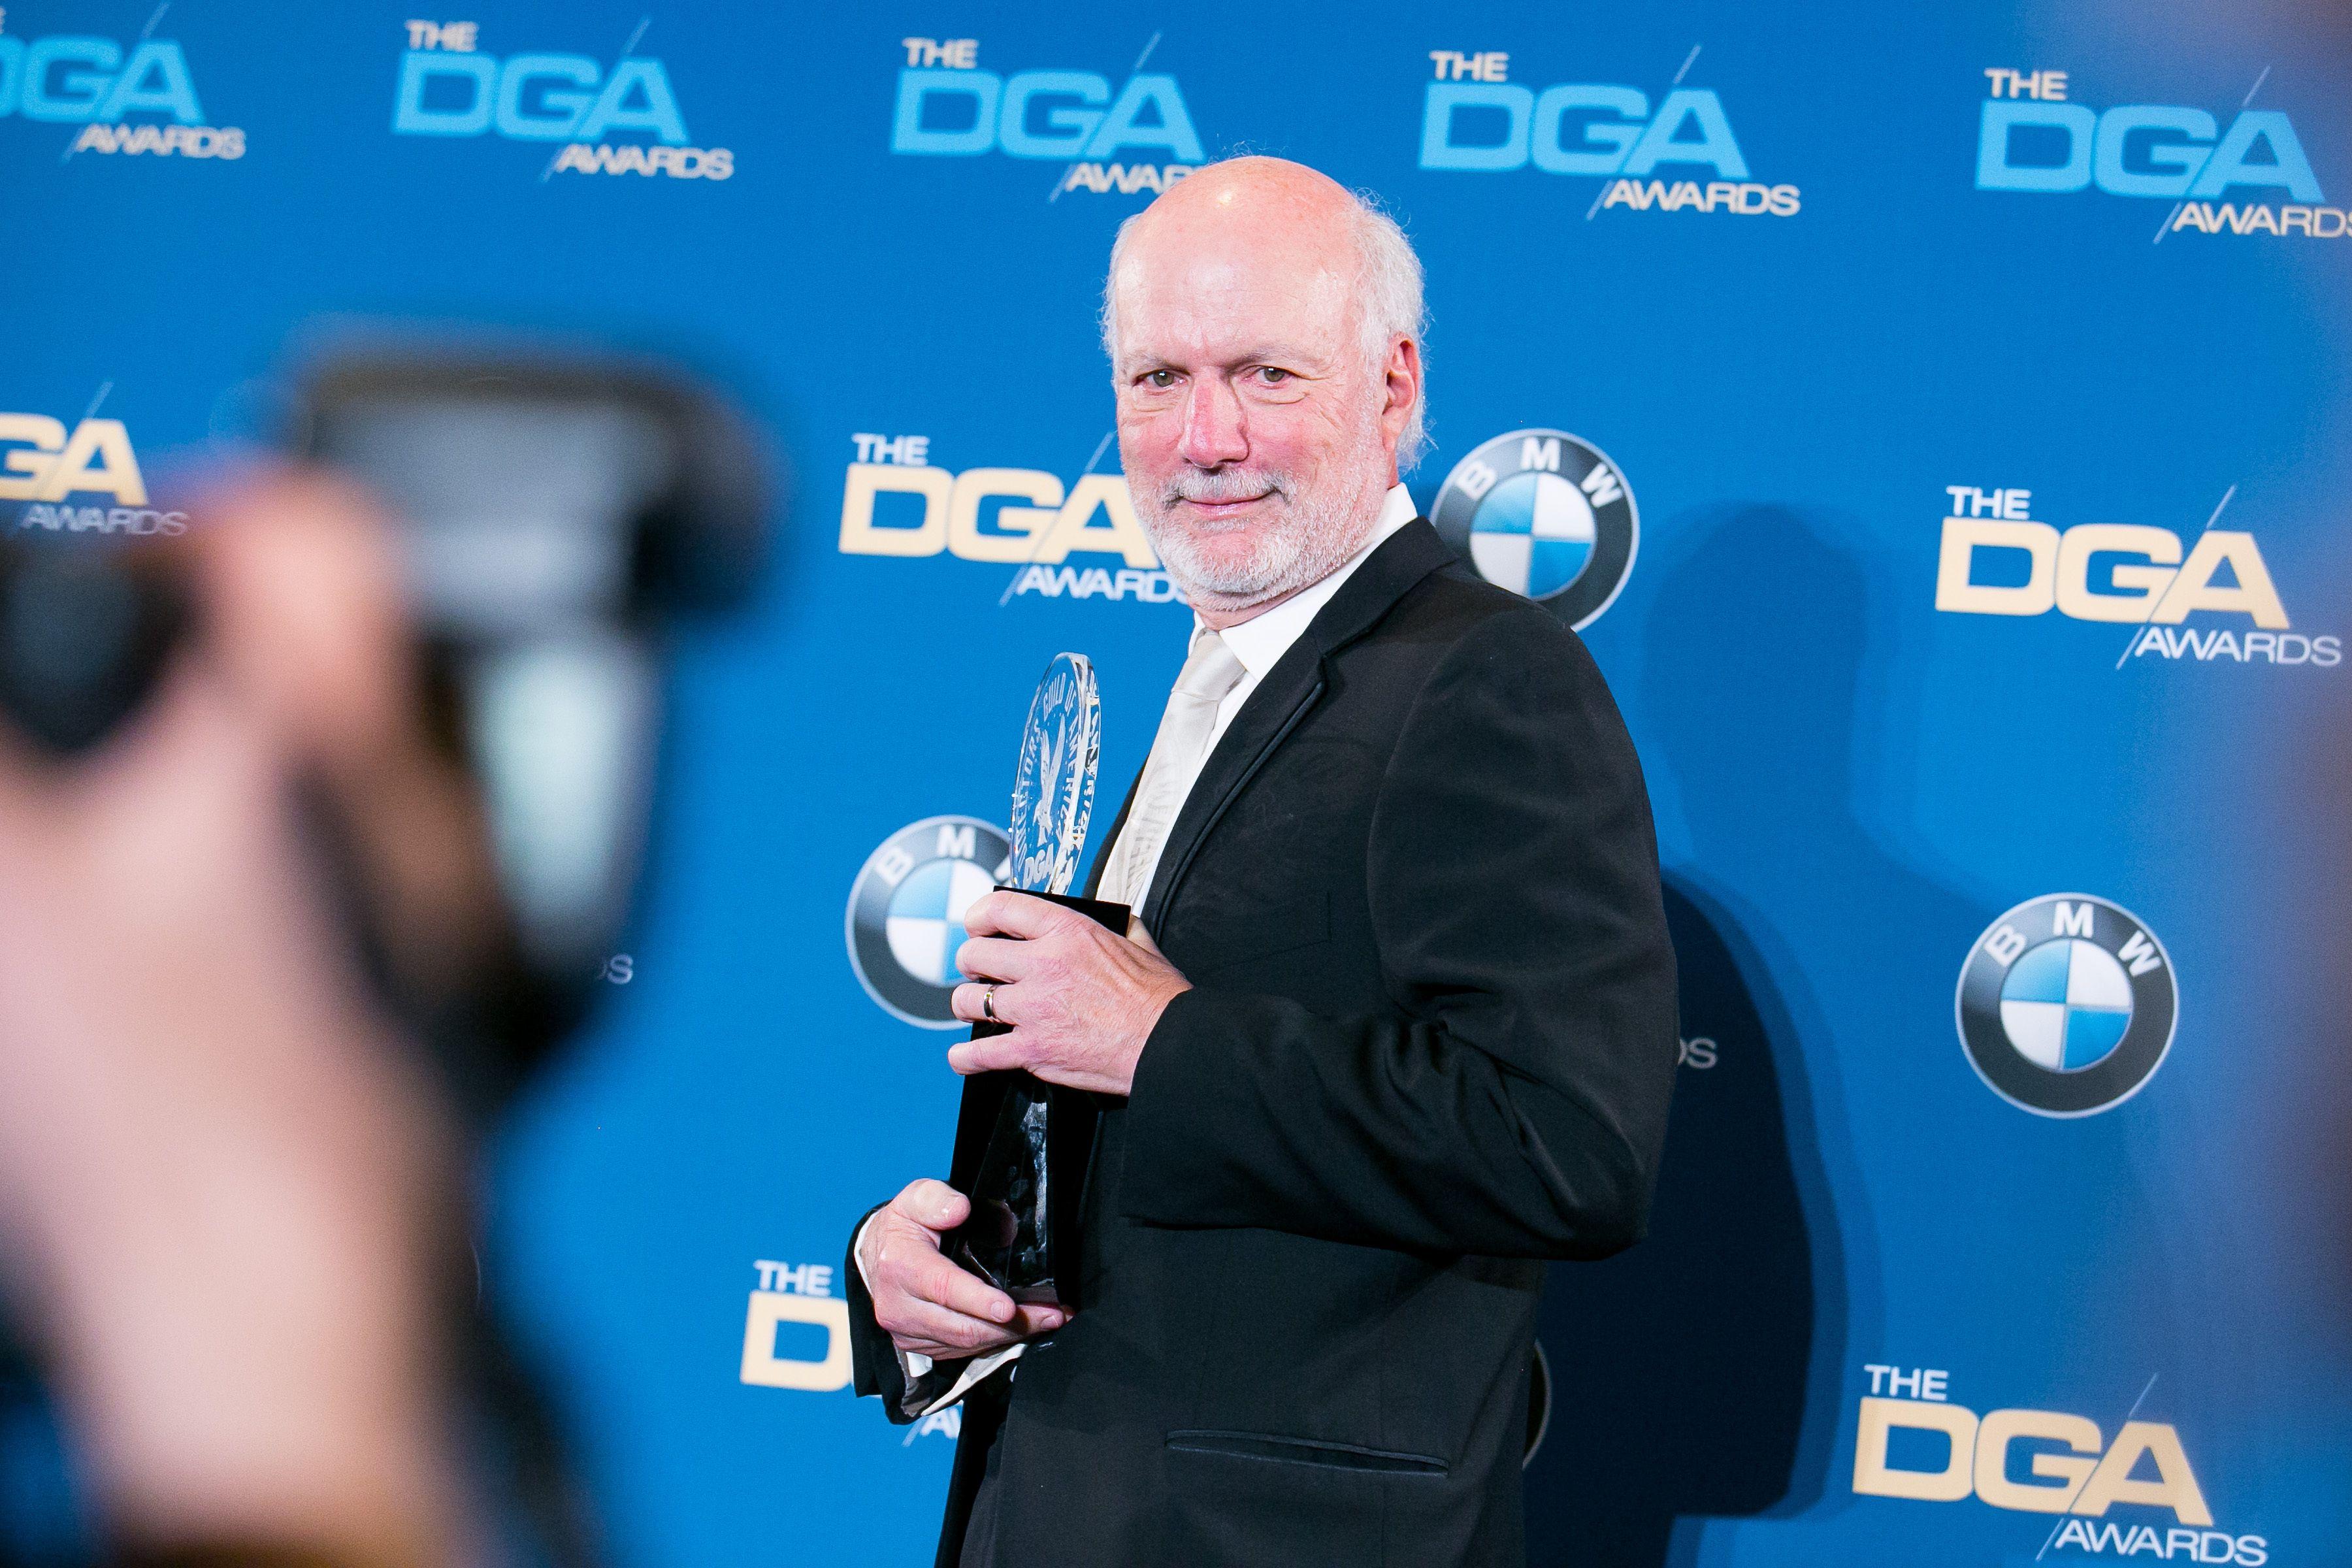 67th Annual DGA Awards, Los Angeles, America - 07 Feb 2015